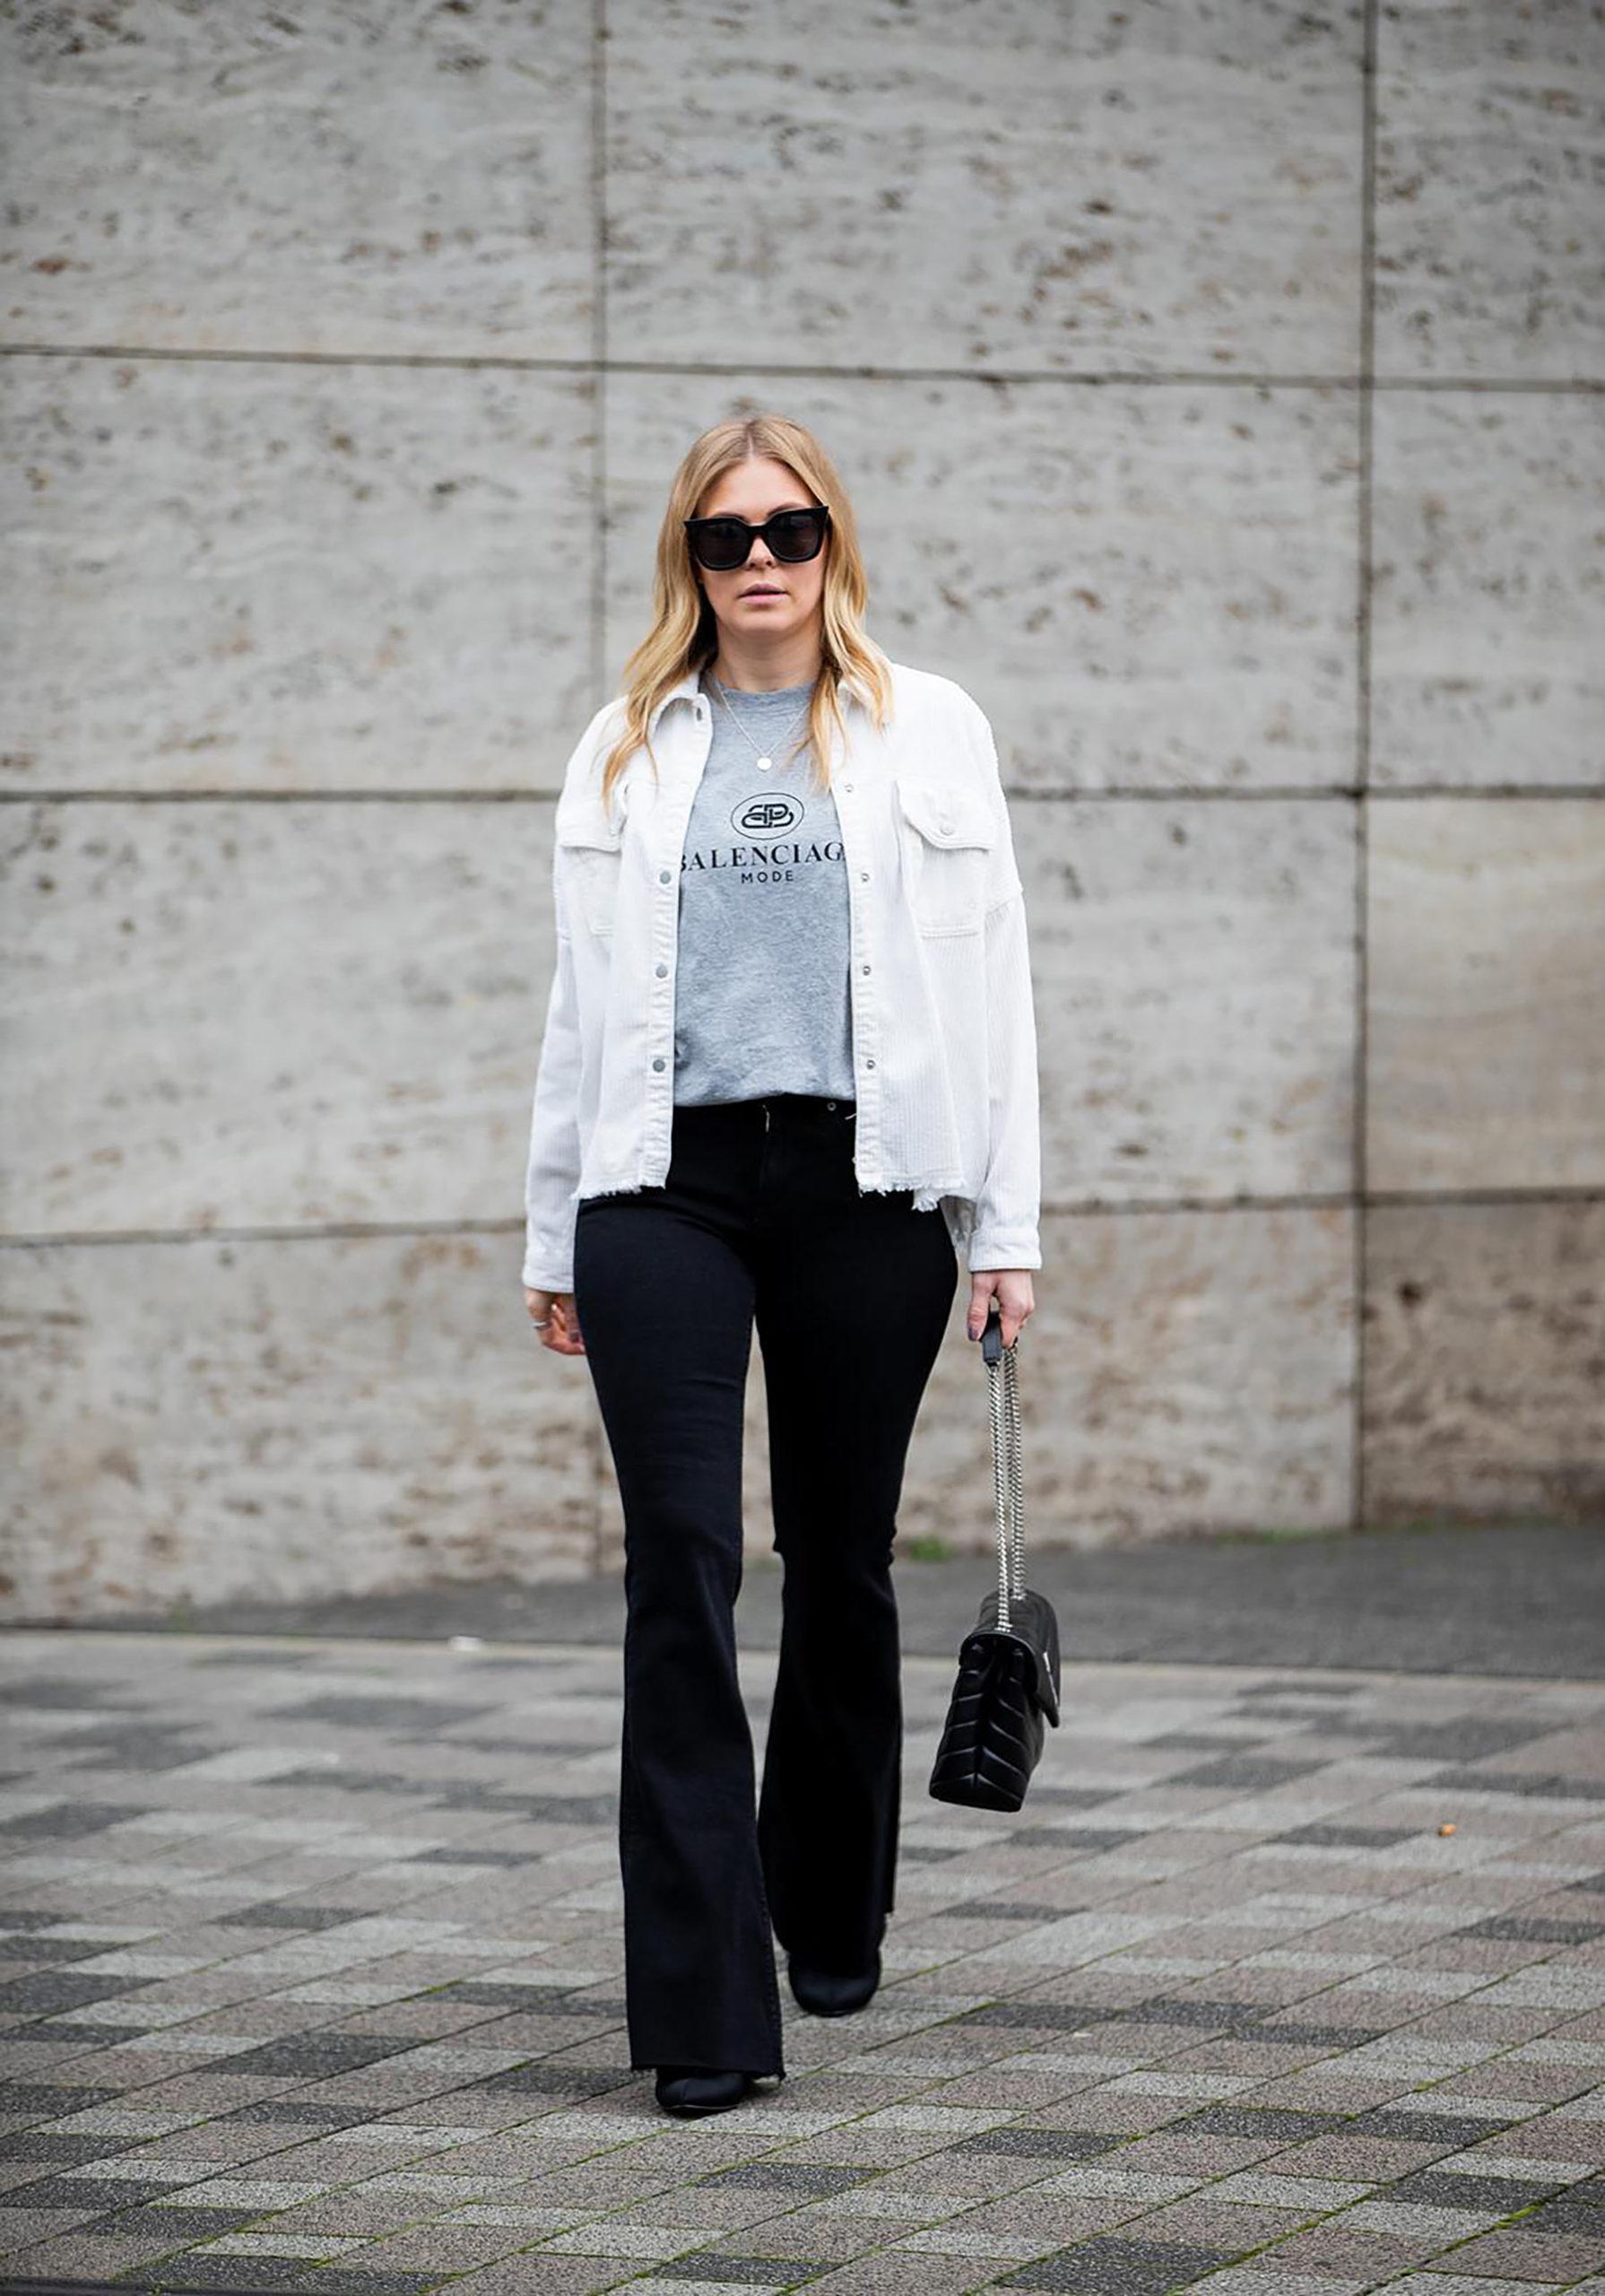 schlaghose schwarz outfit modetrend fashion blog inga brauer